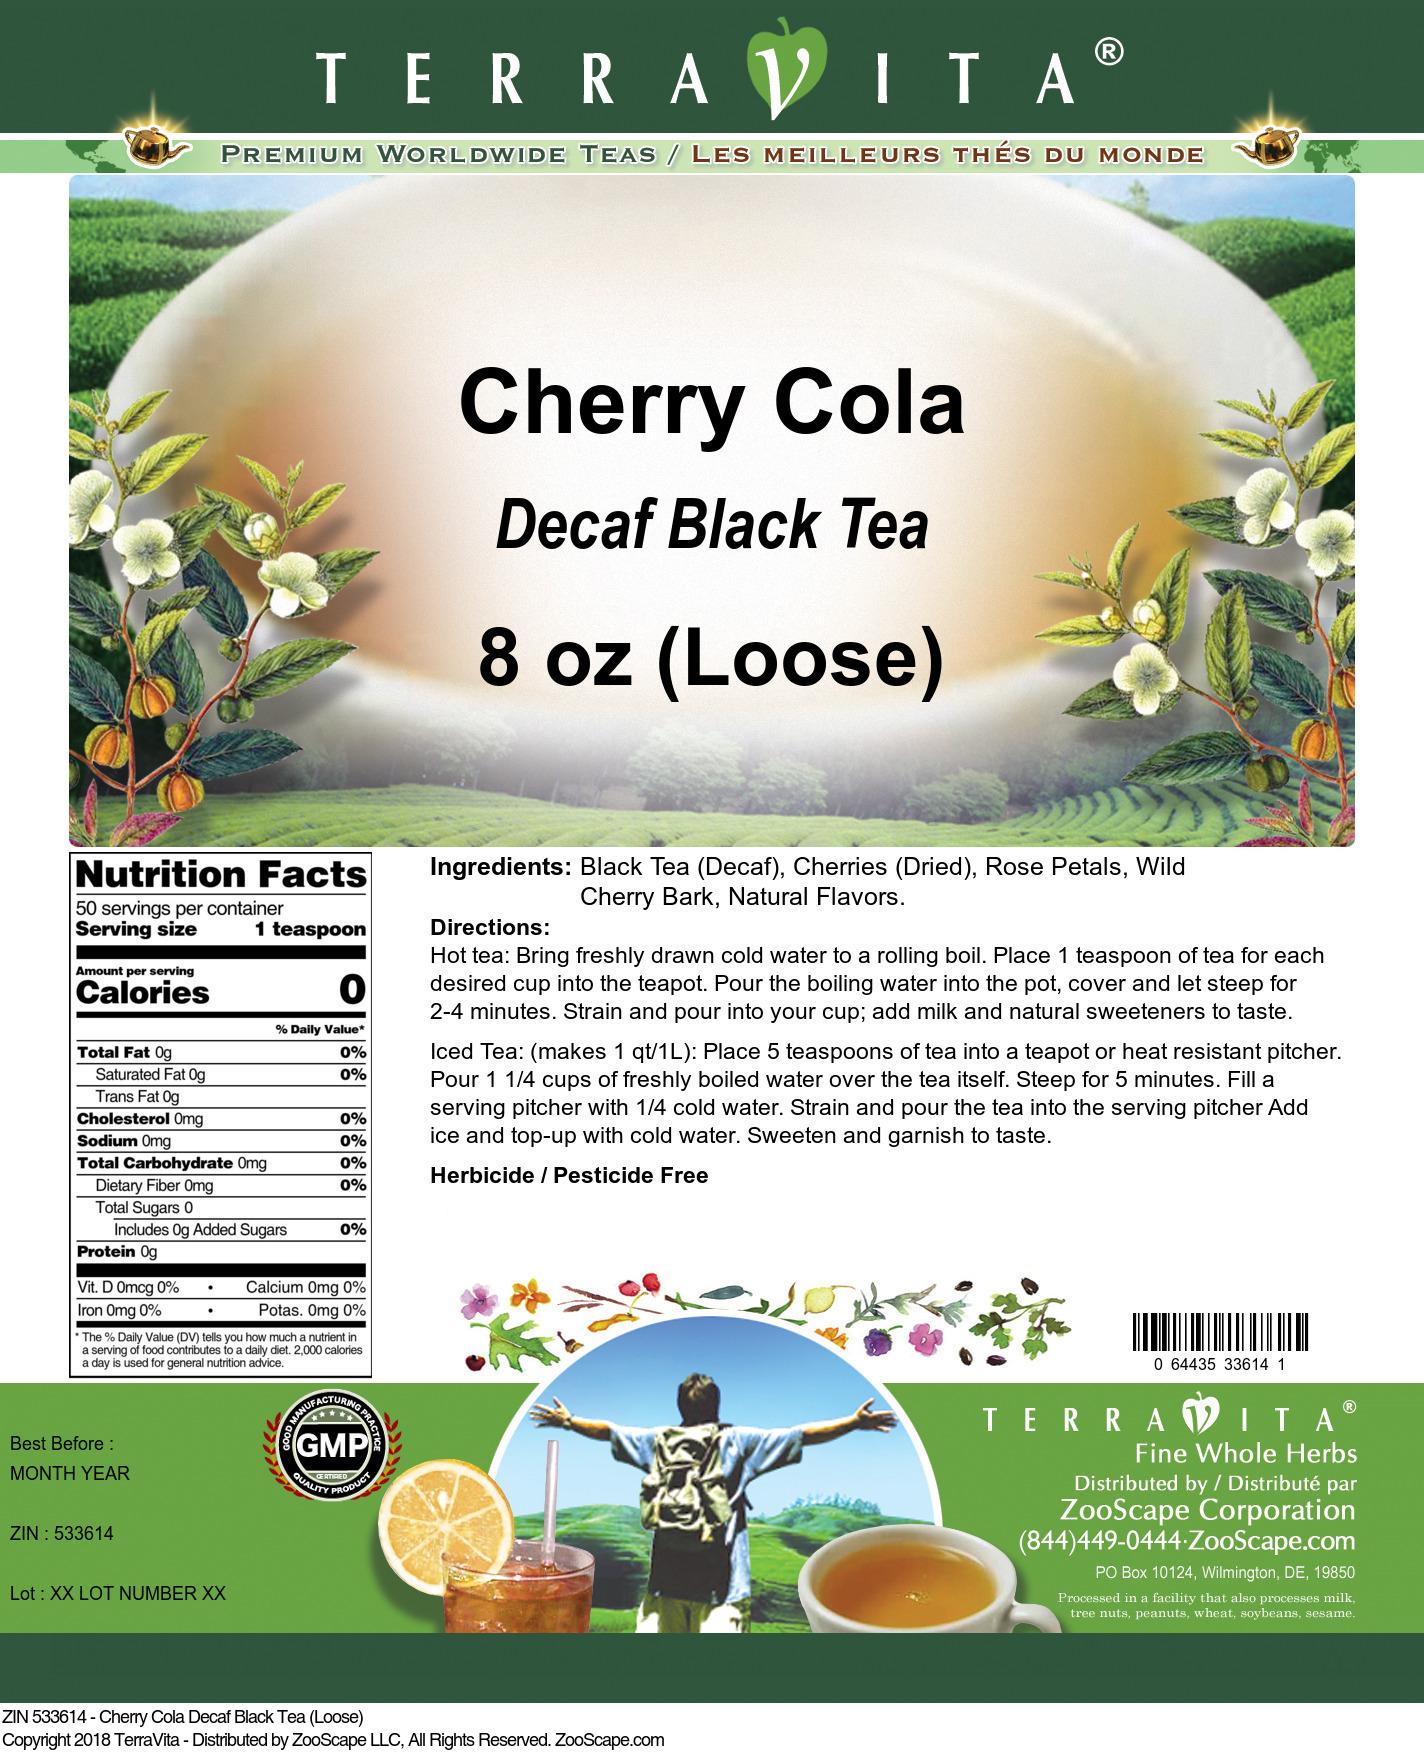 Cherry Cola Decaf Black Tea (Loose)